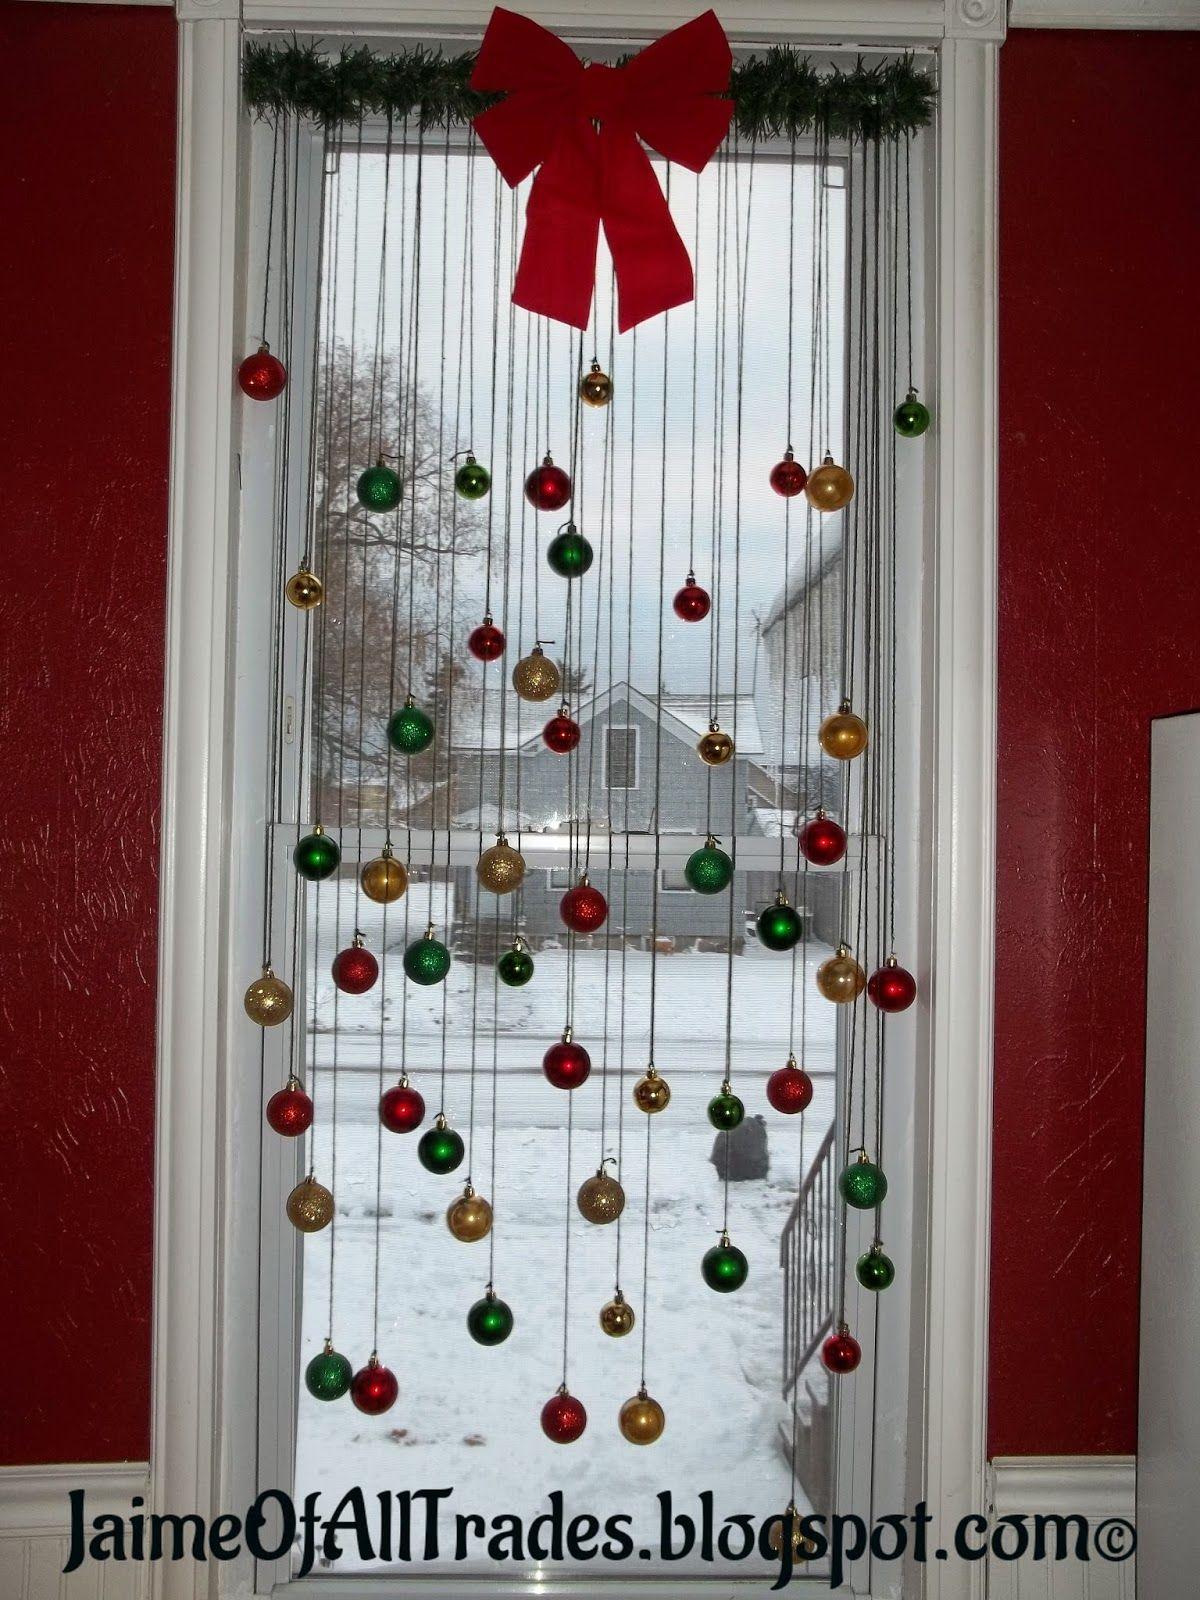 Diy Christmas Window Decoration Find The Tutorial At Jaimeofalltrades Blo